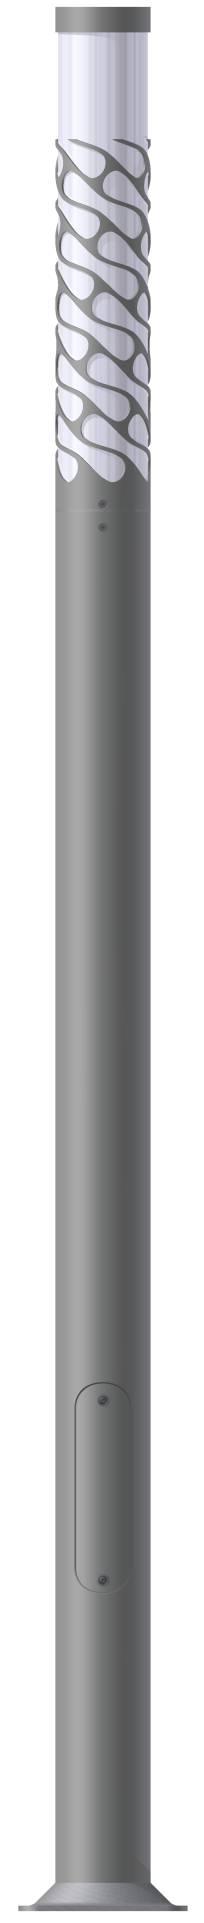 COLONNE LED KARIN DECOR 3600 LED